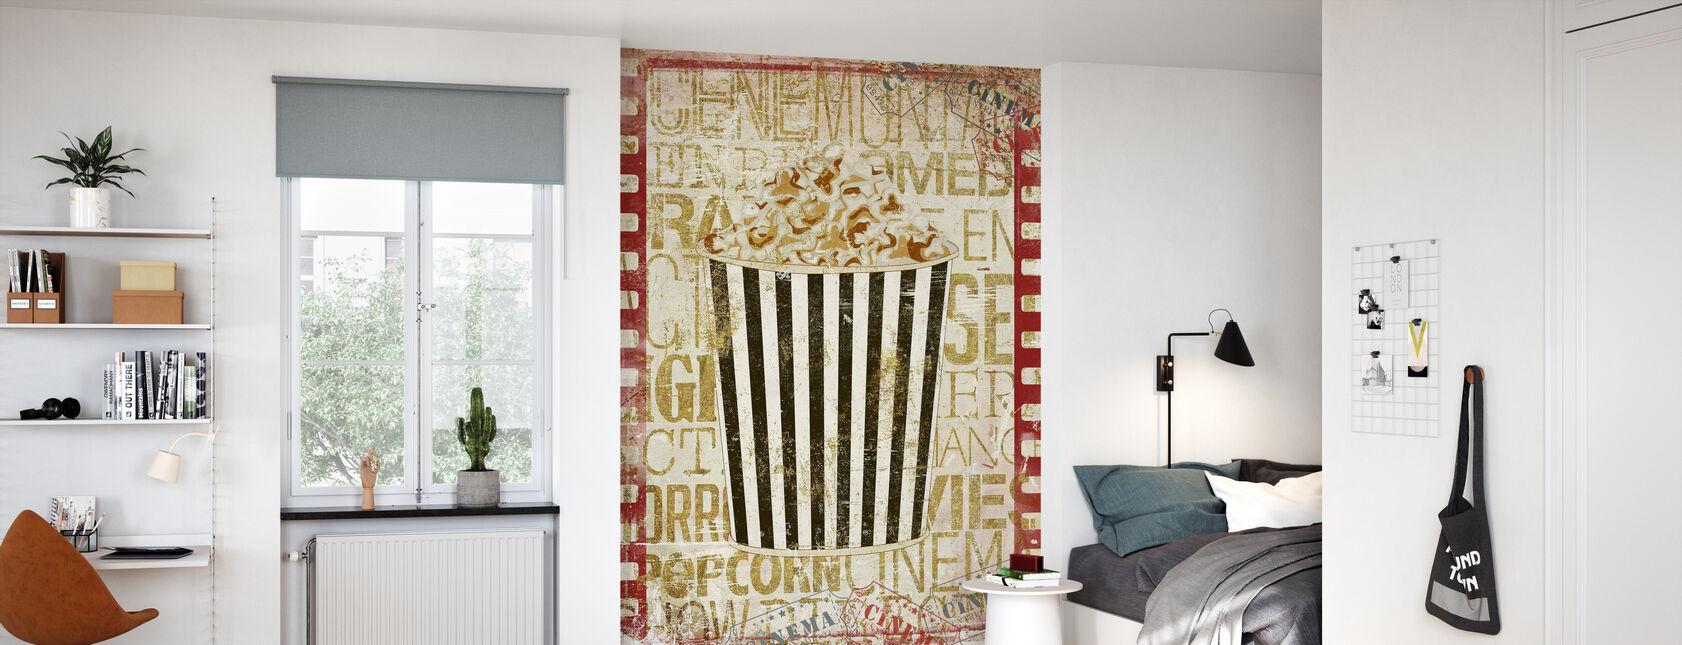 Kino popcorn - Tapet - Barnerom